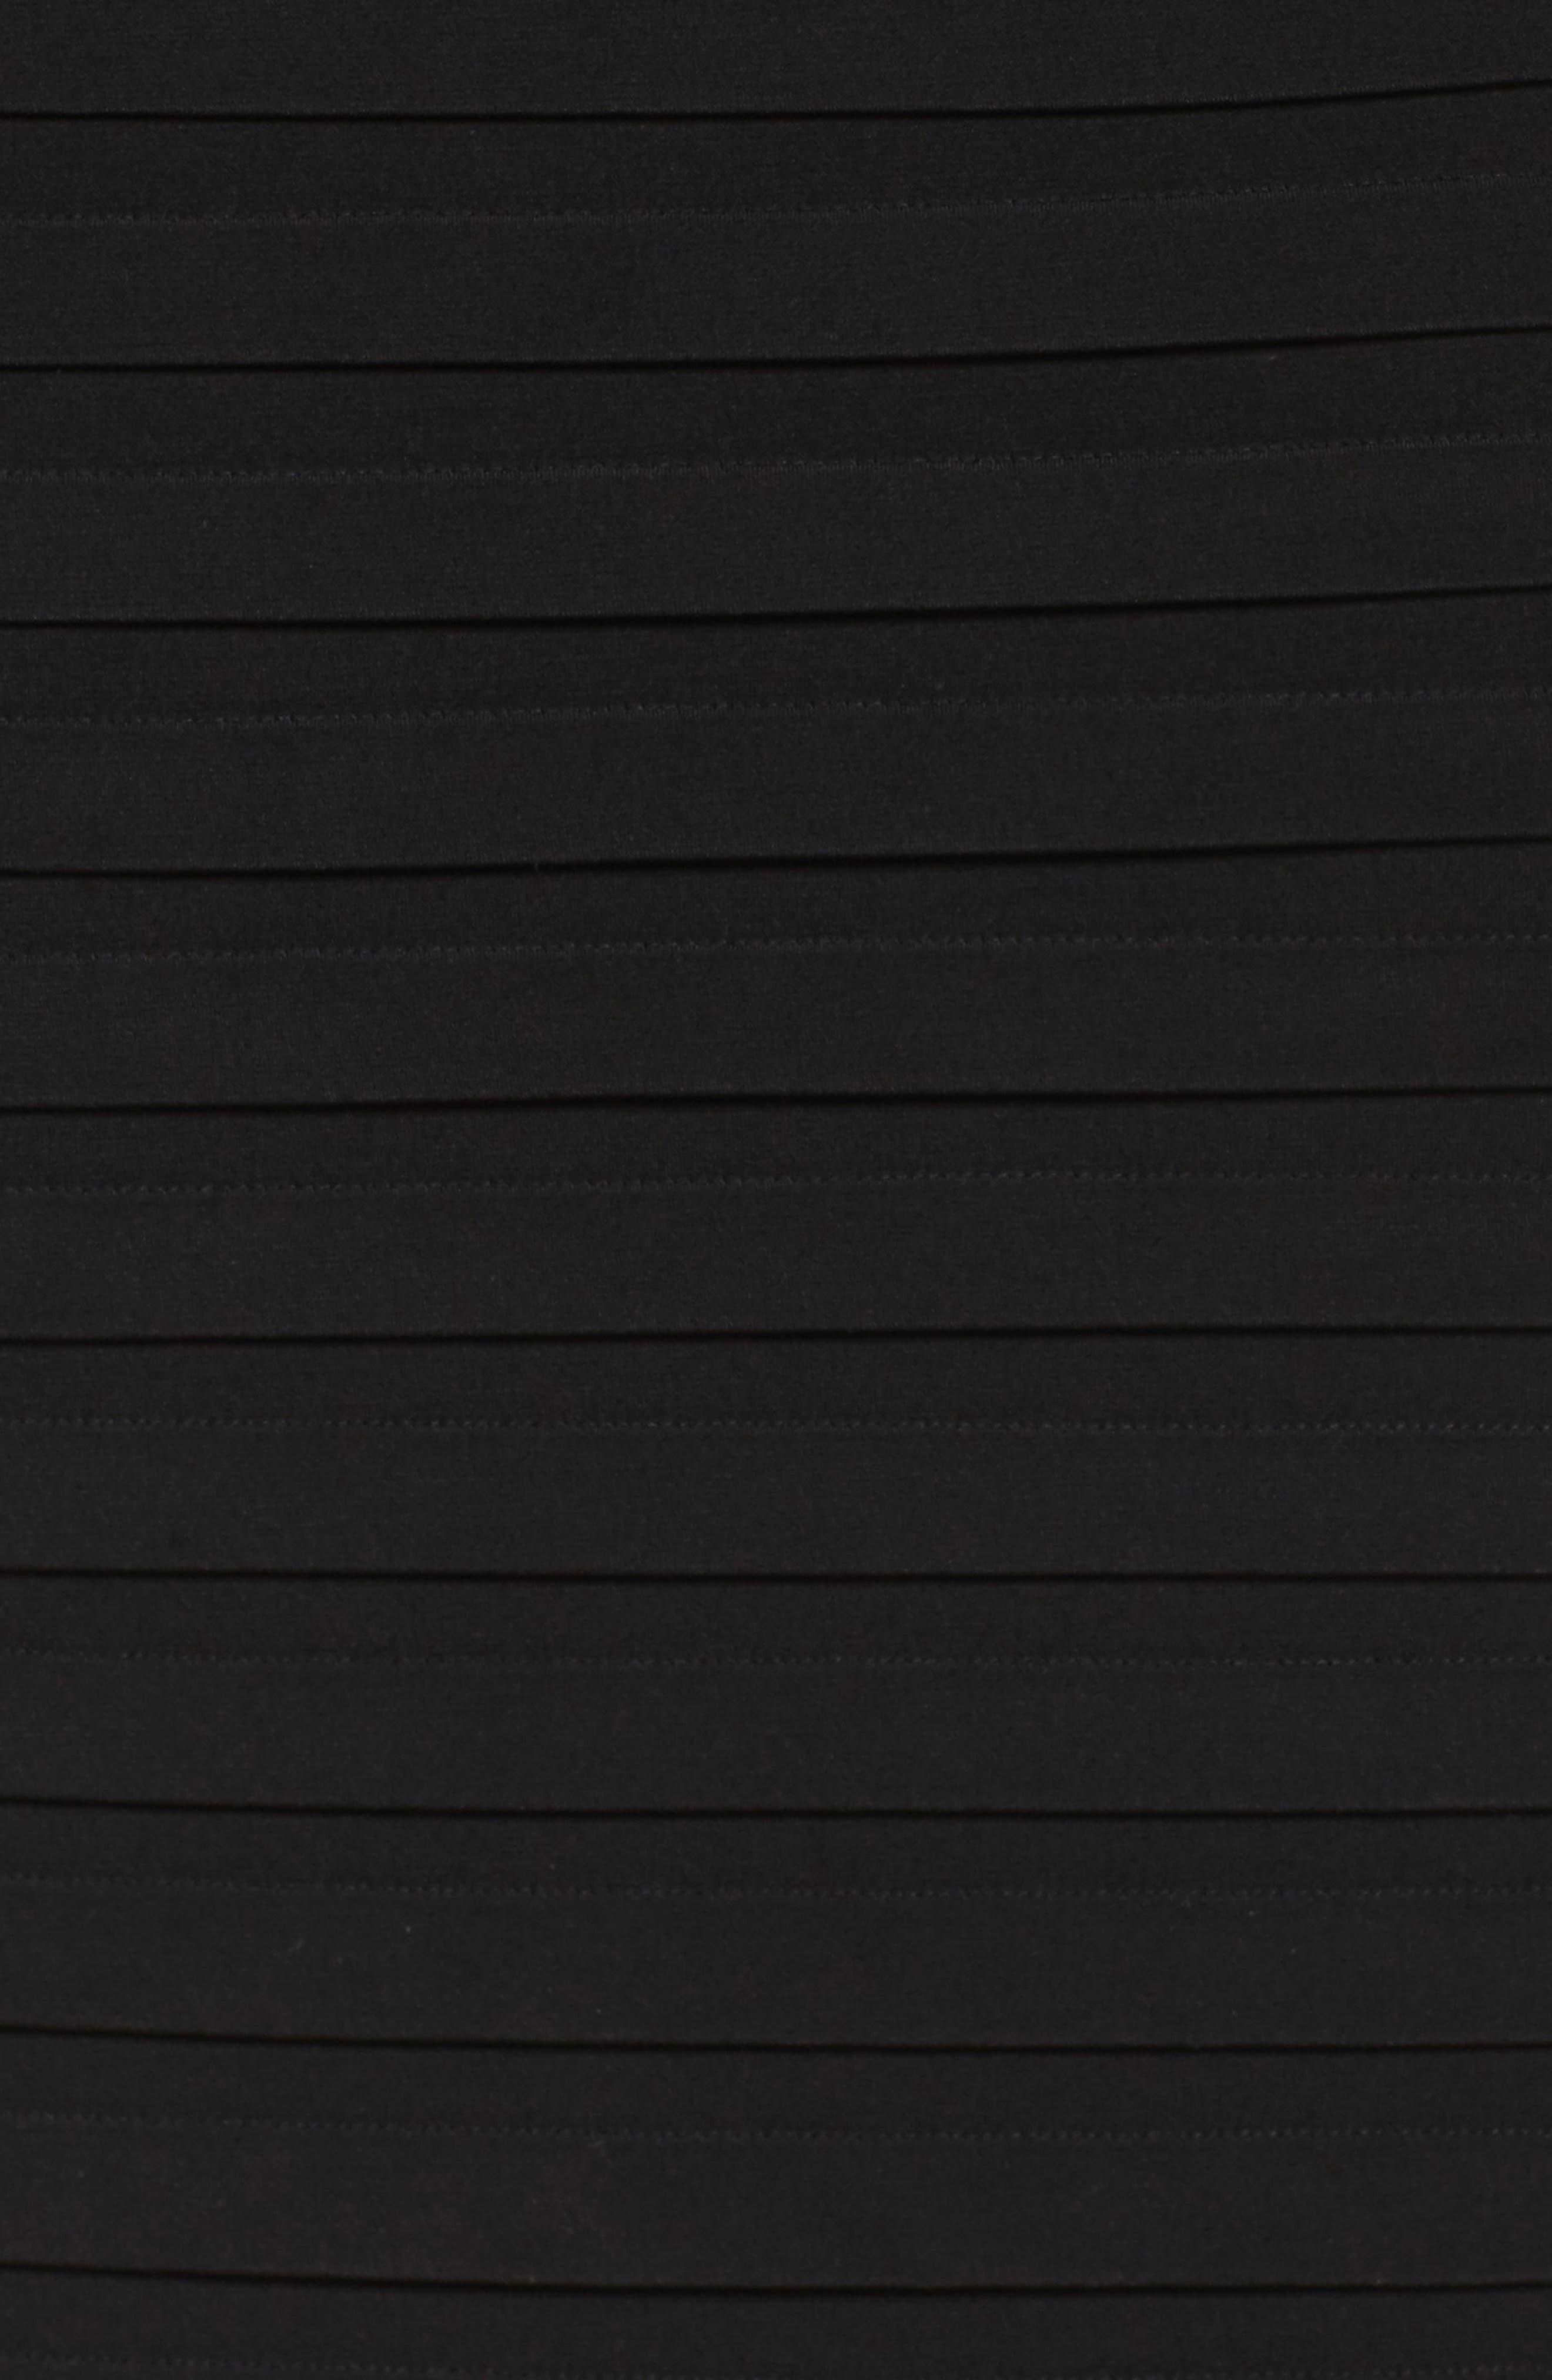 Matte Jersey Shutter Pleat Dress,                             Alternate thumbnail 5, color,                             Black